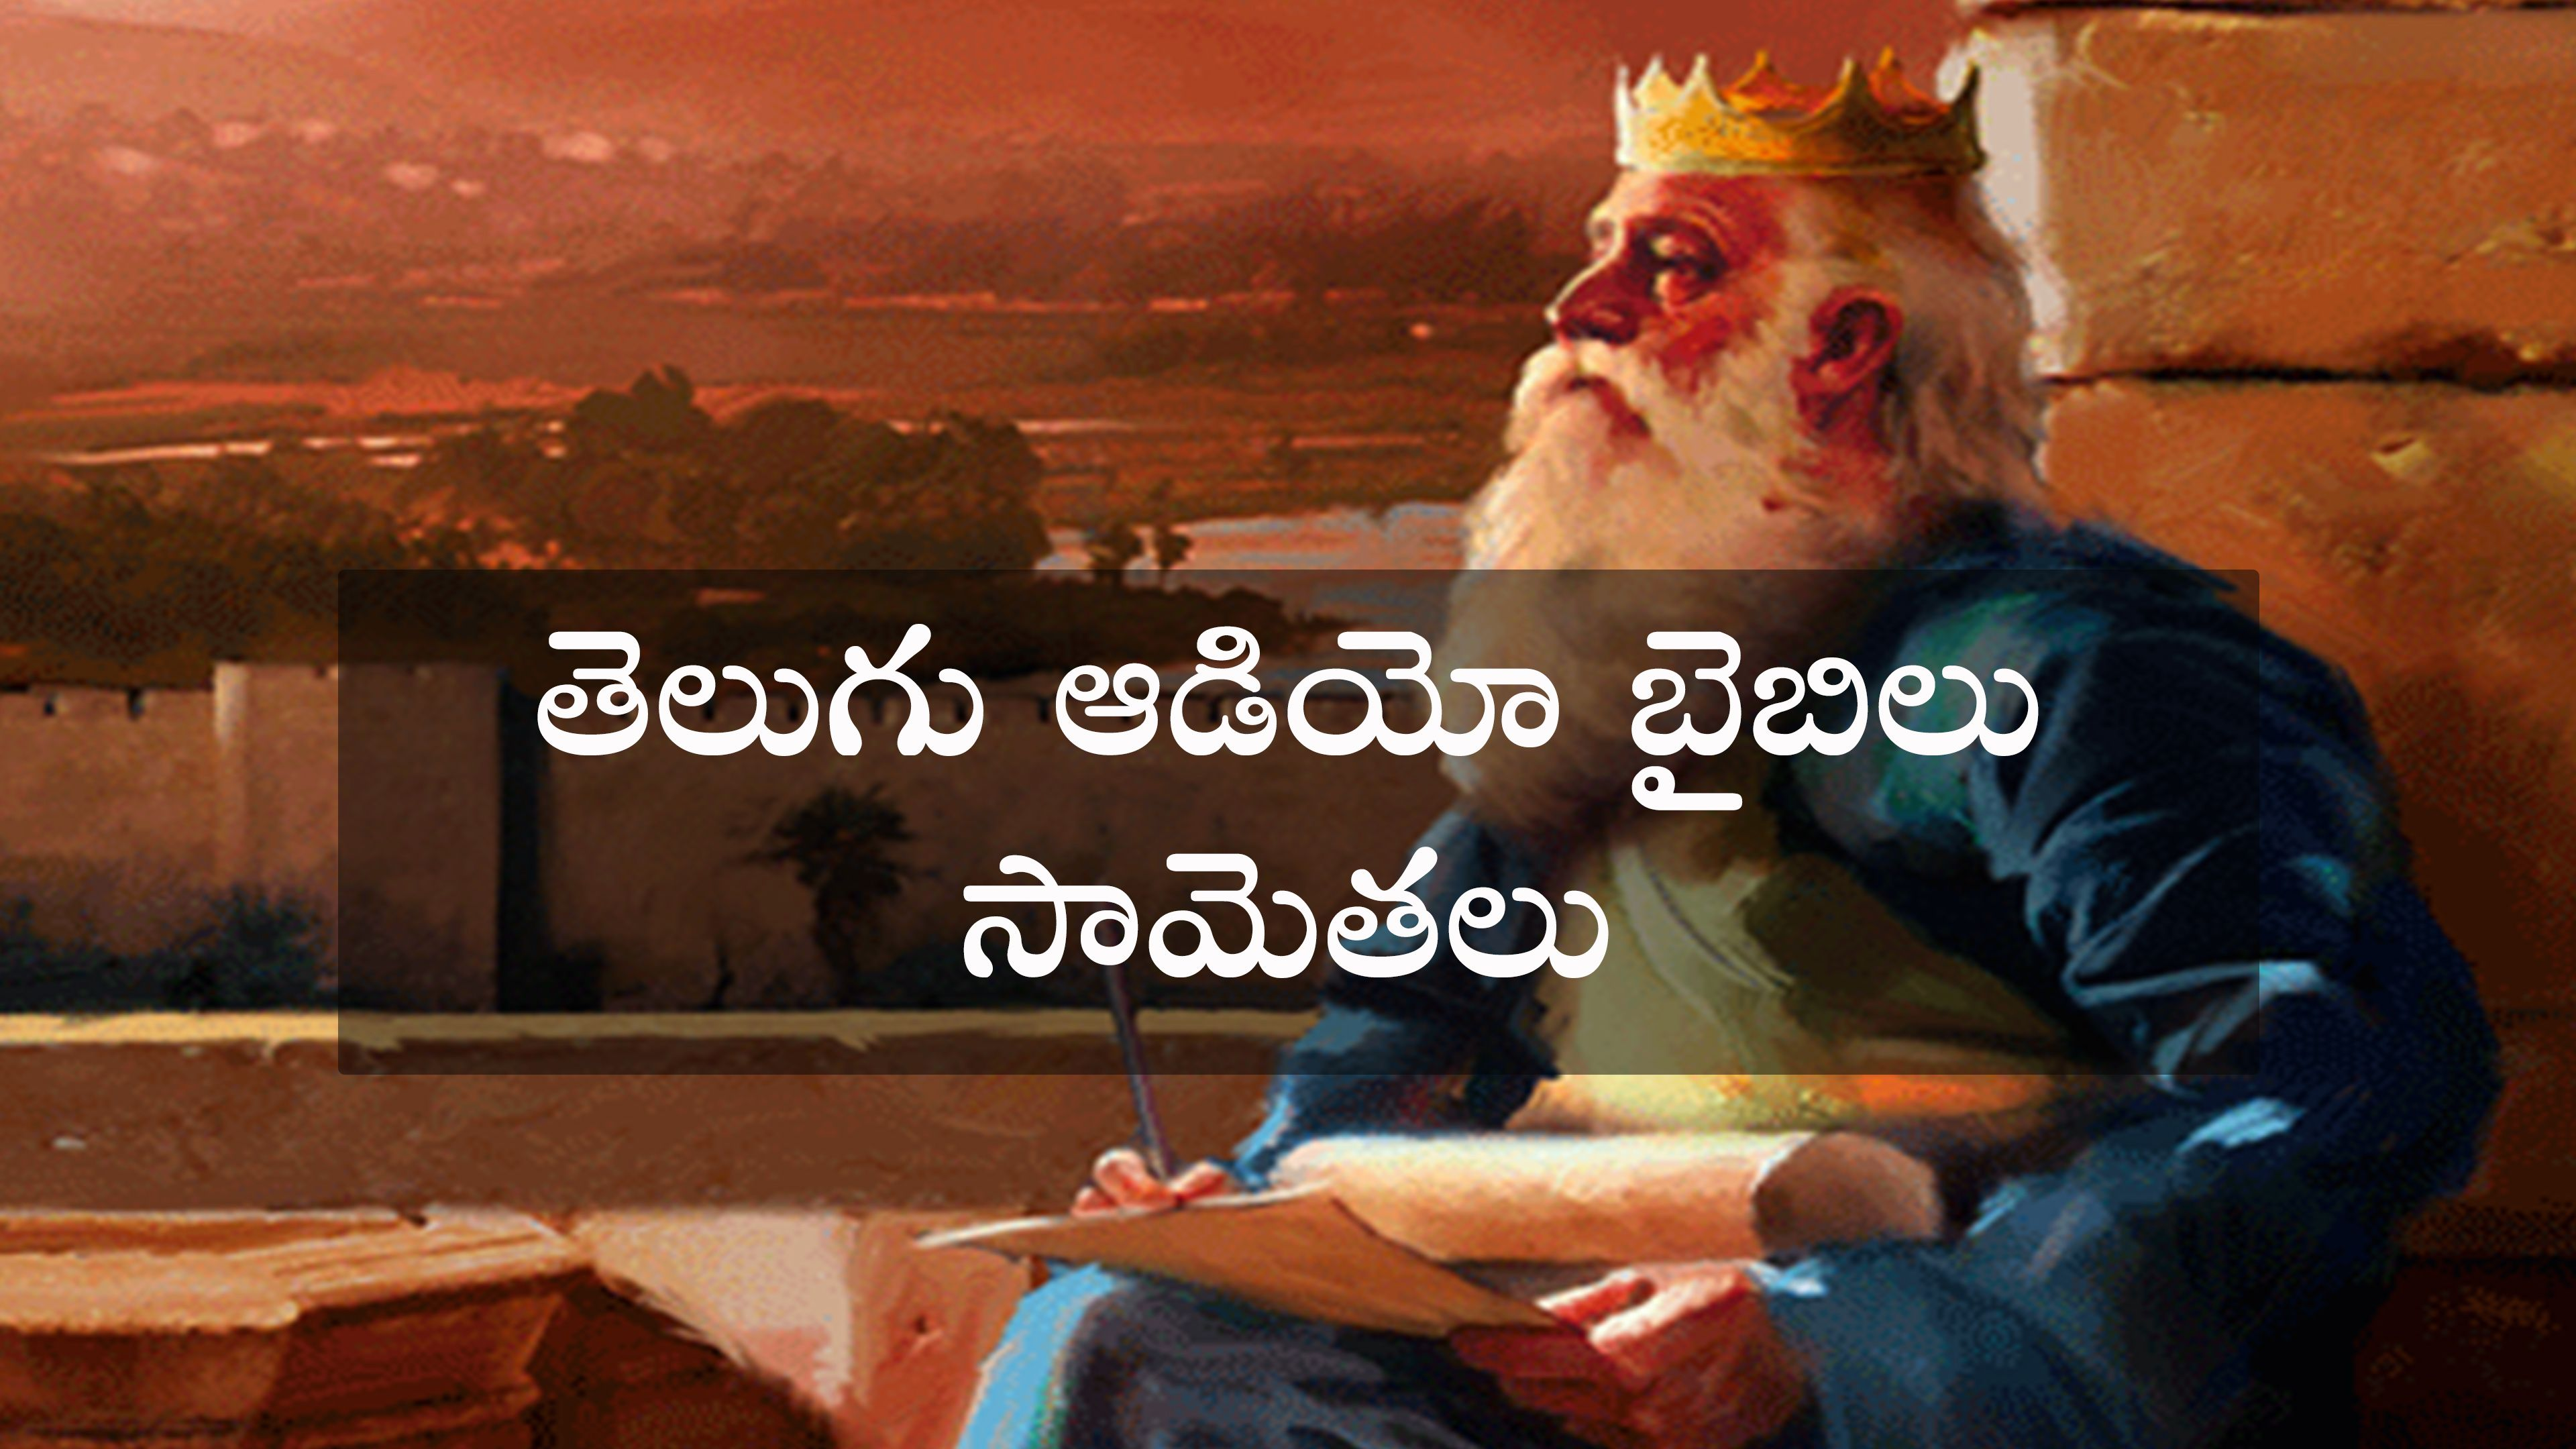 complete audio of the books of proverbs in telugu | Telugu